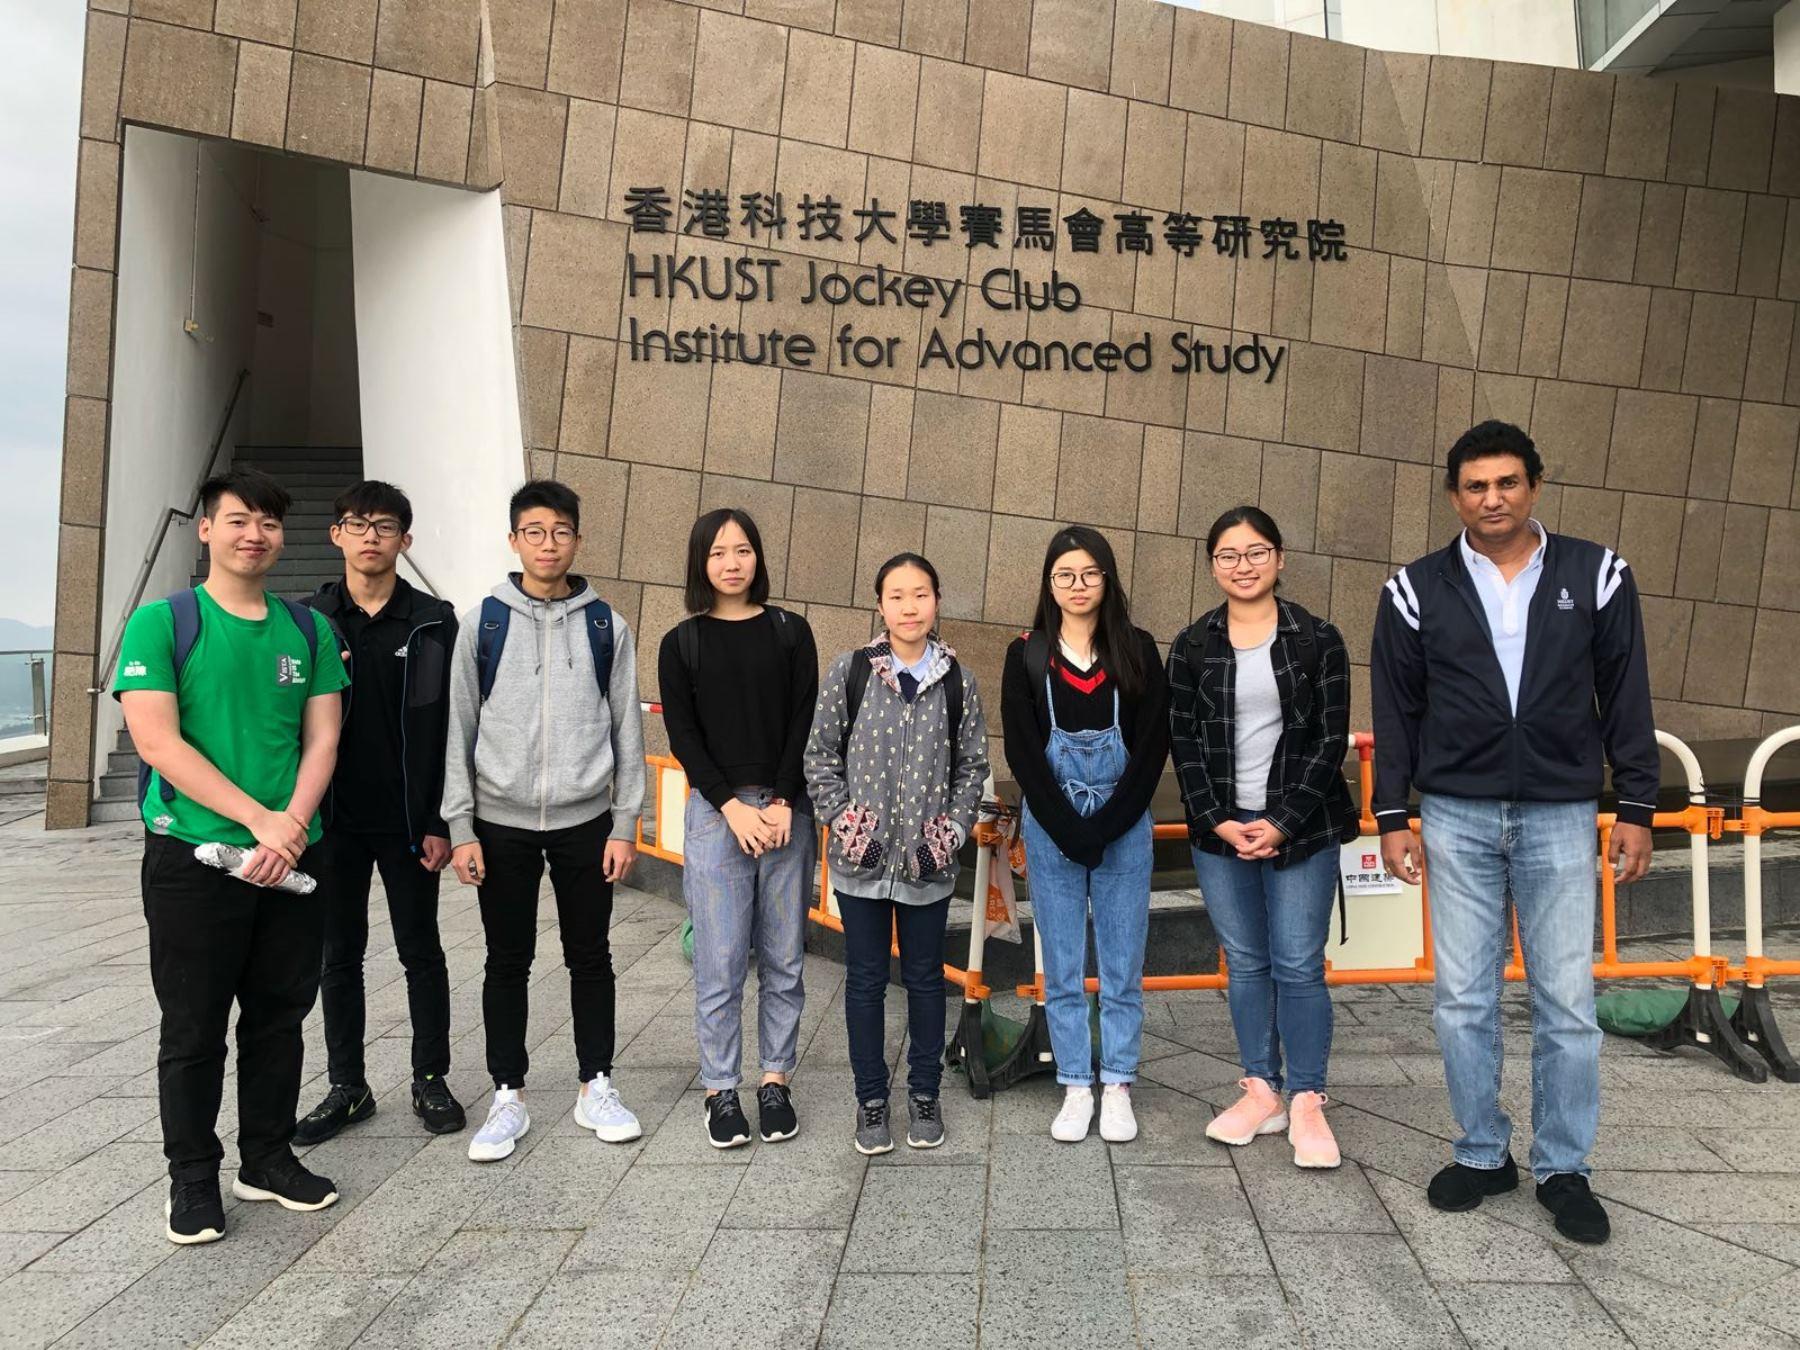 https://www.npc.edu.hk/sites/default/files/1_1445.jpg